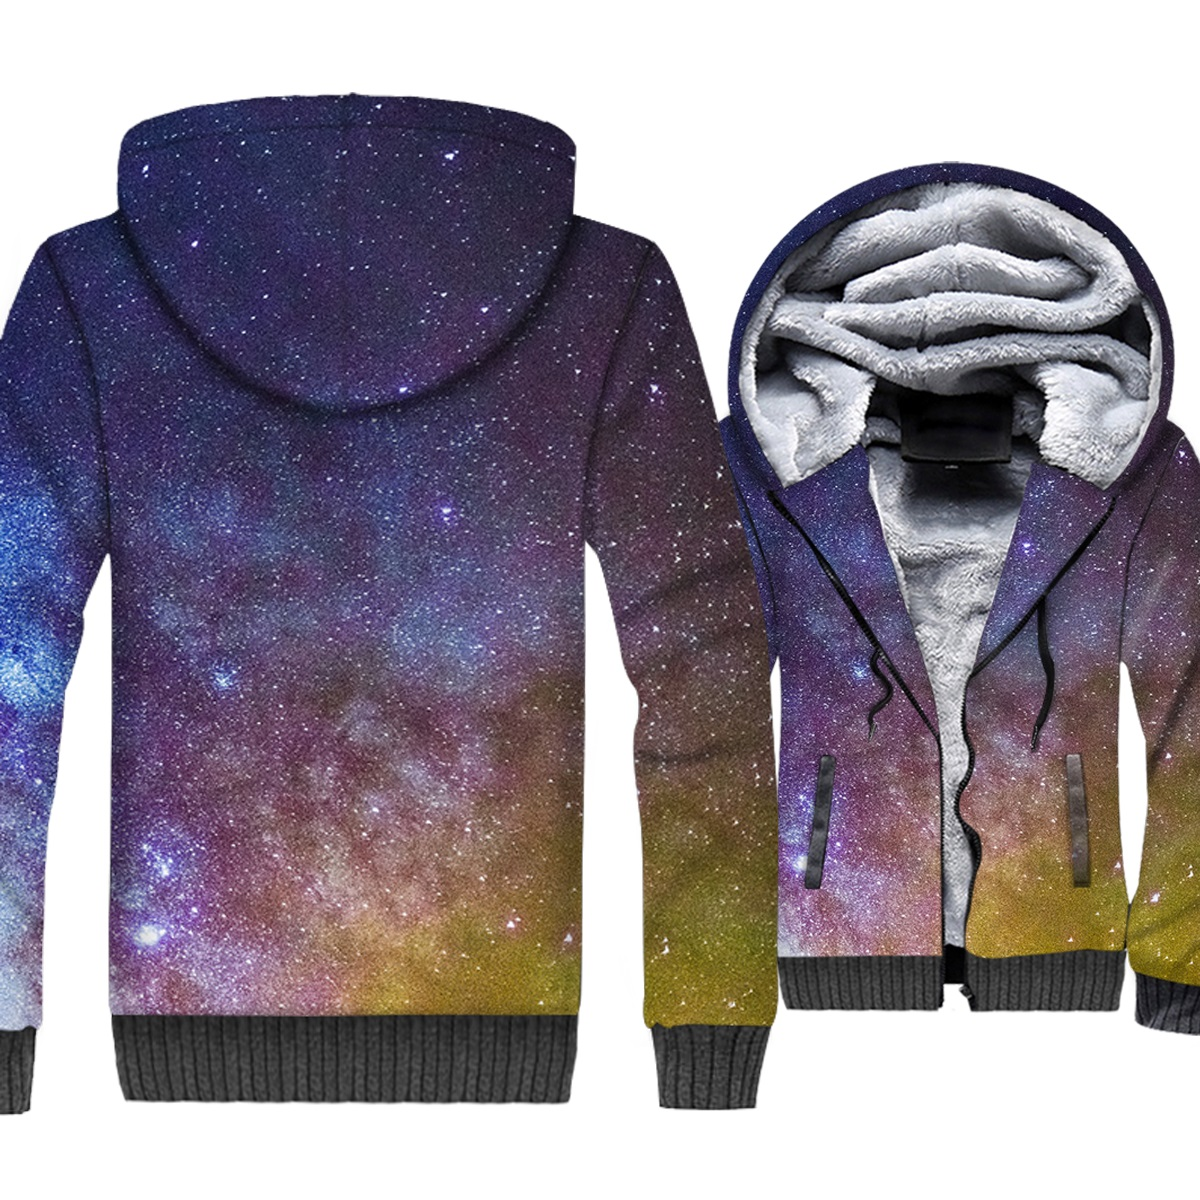 Humorous 2018 New 347 Galaxy Colorful Graffiti Monkey Printed Women Jacket Hooded Femme Sweatshirt Casual Loose Men Pocket Hoodies Coat Men's Clothing